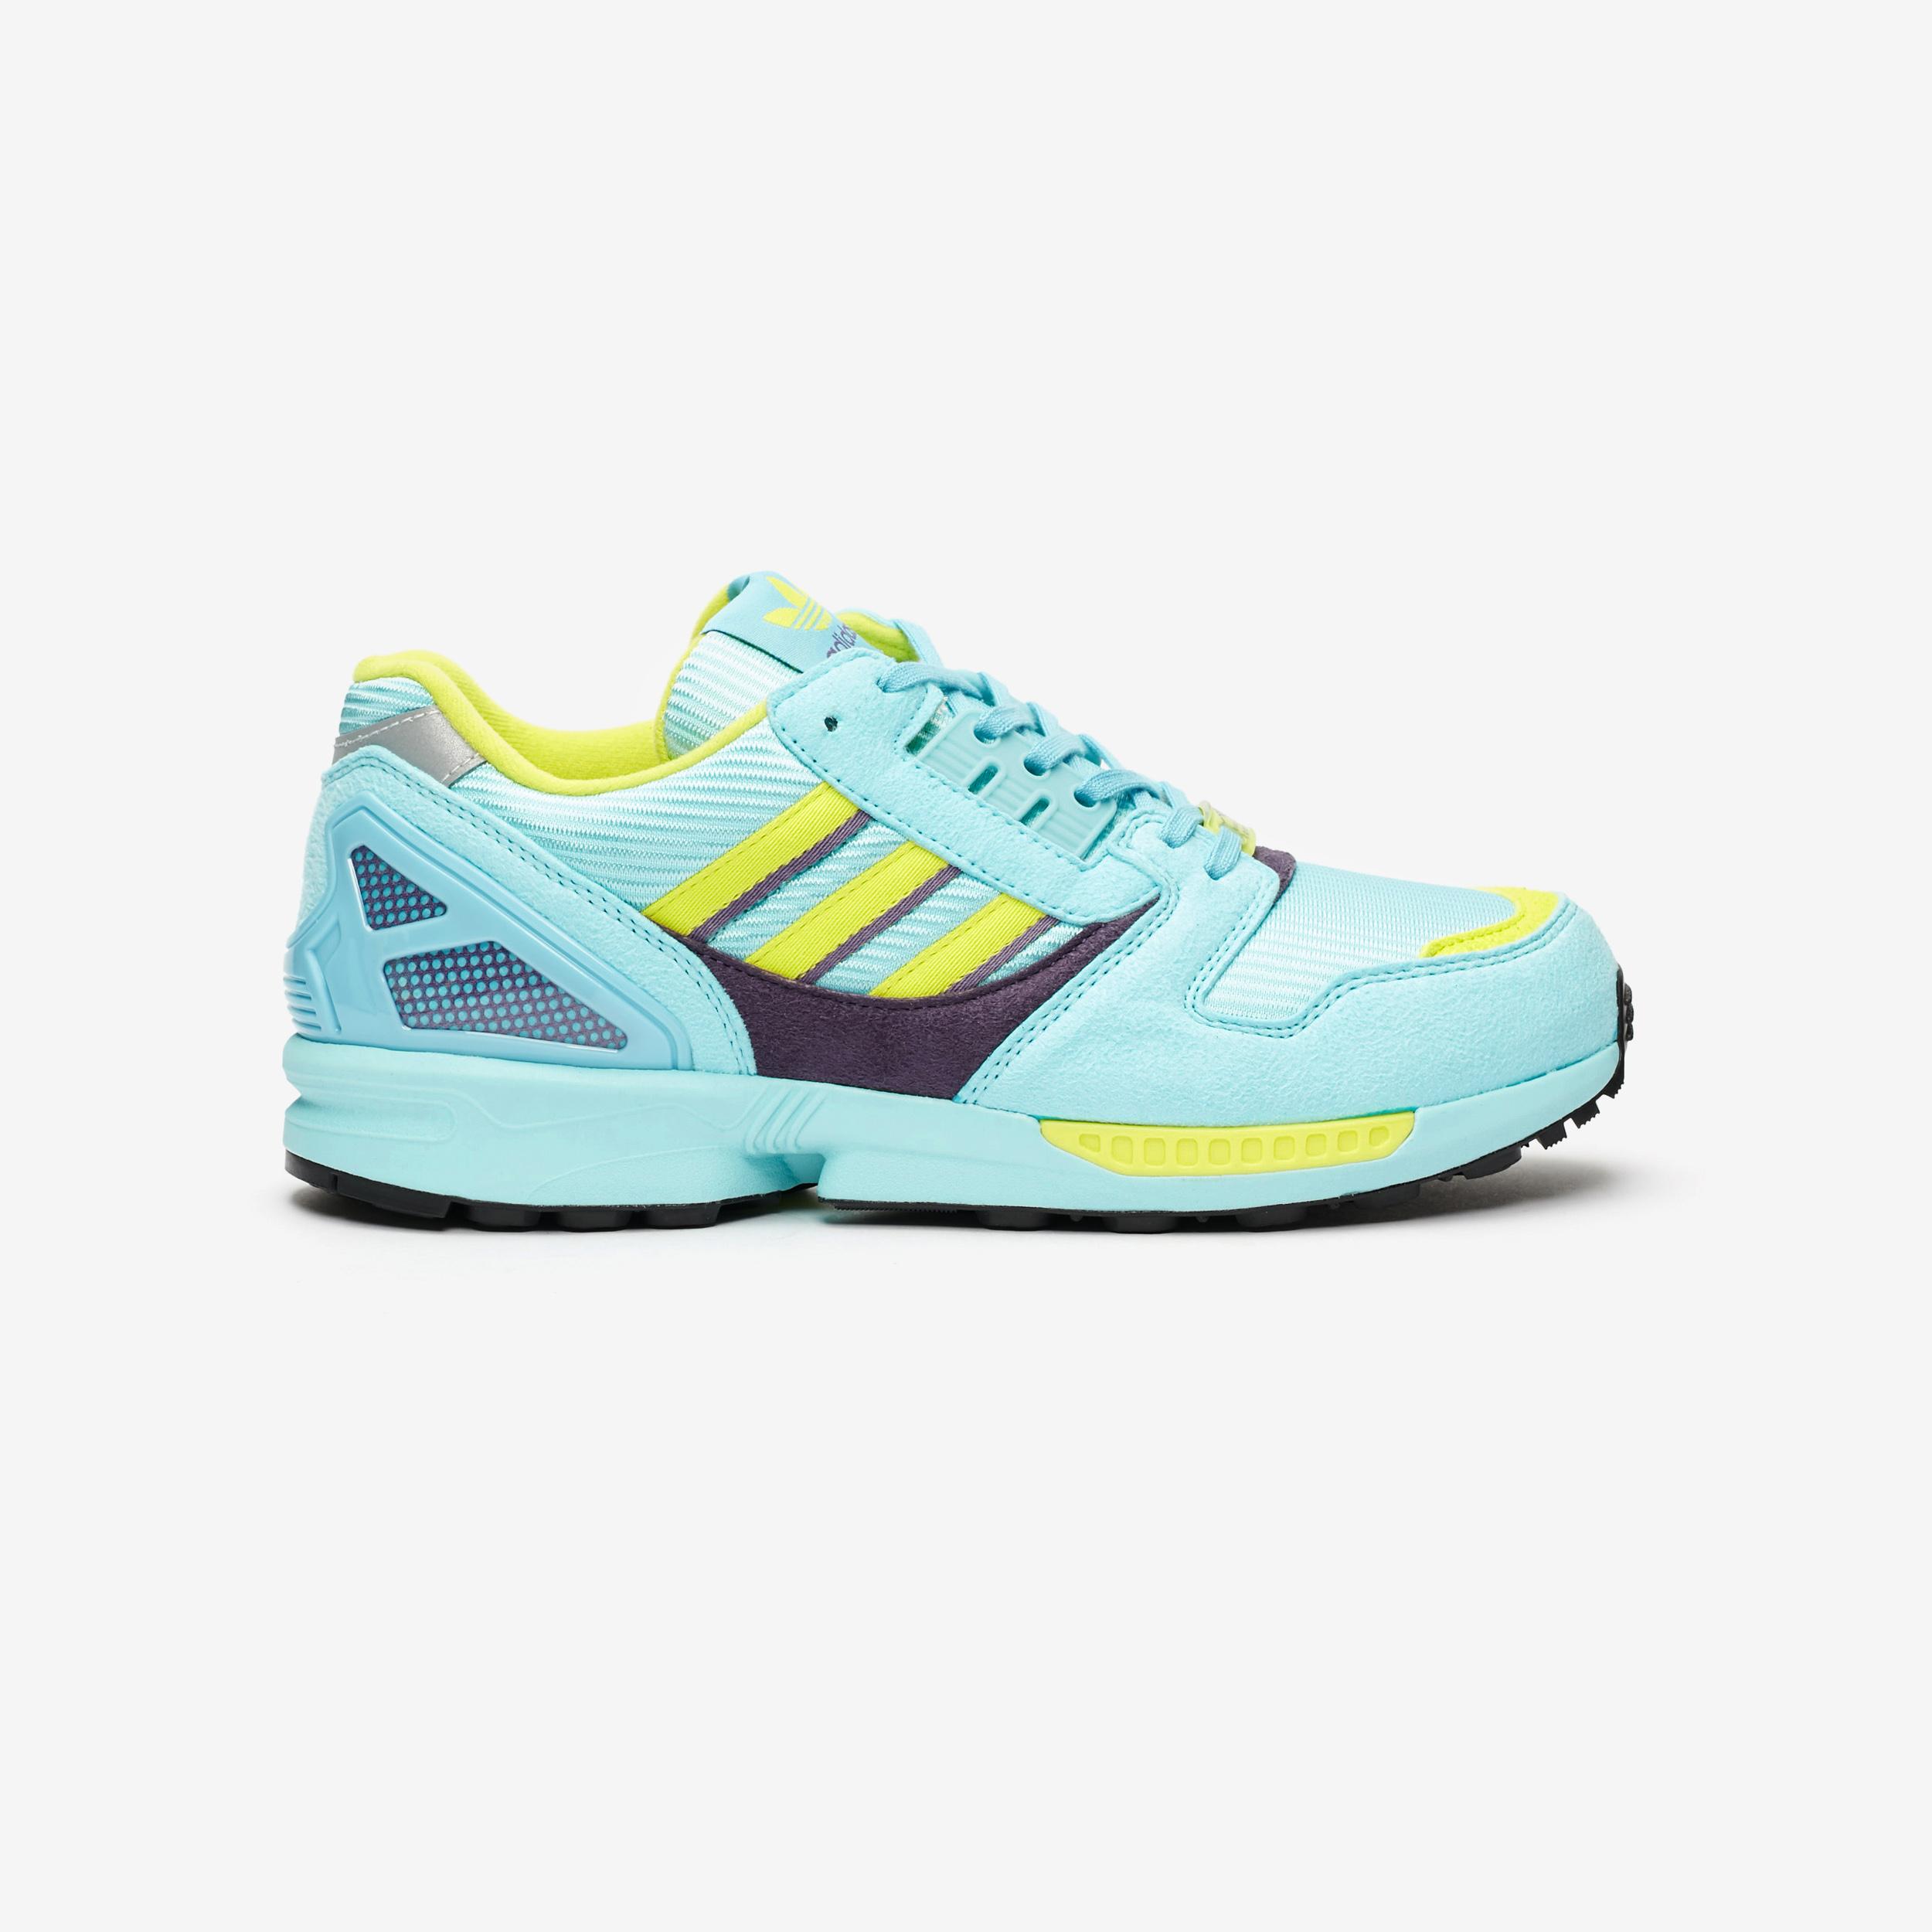 adidas ZX 8000 Eg8784 Sneakersnstuff I Sneakers